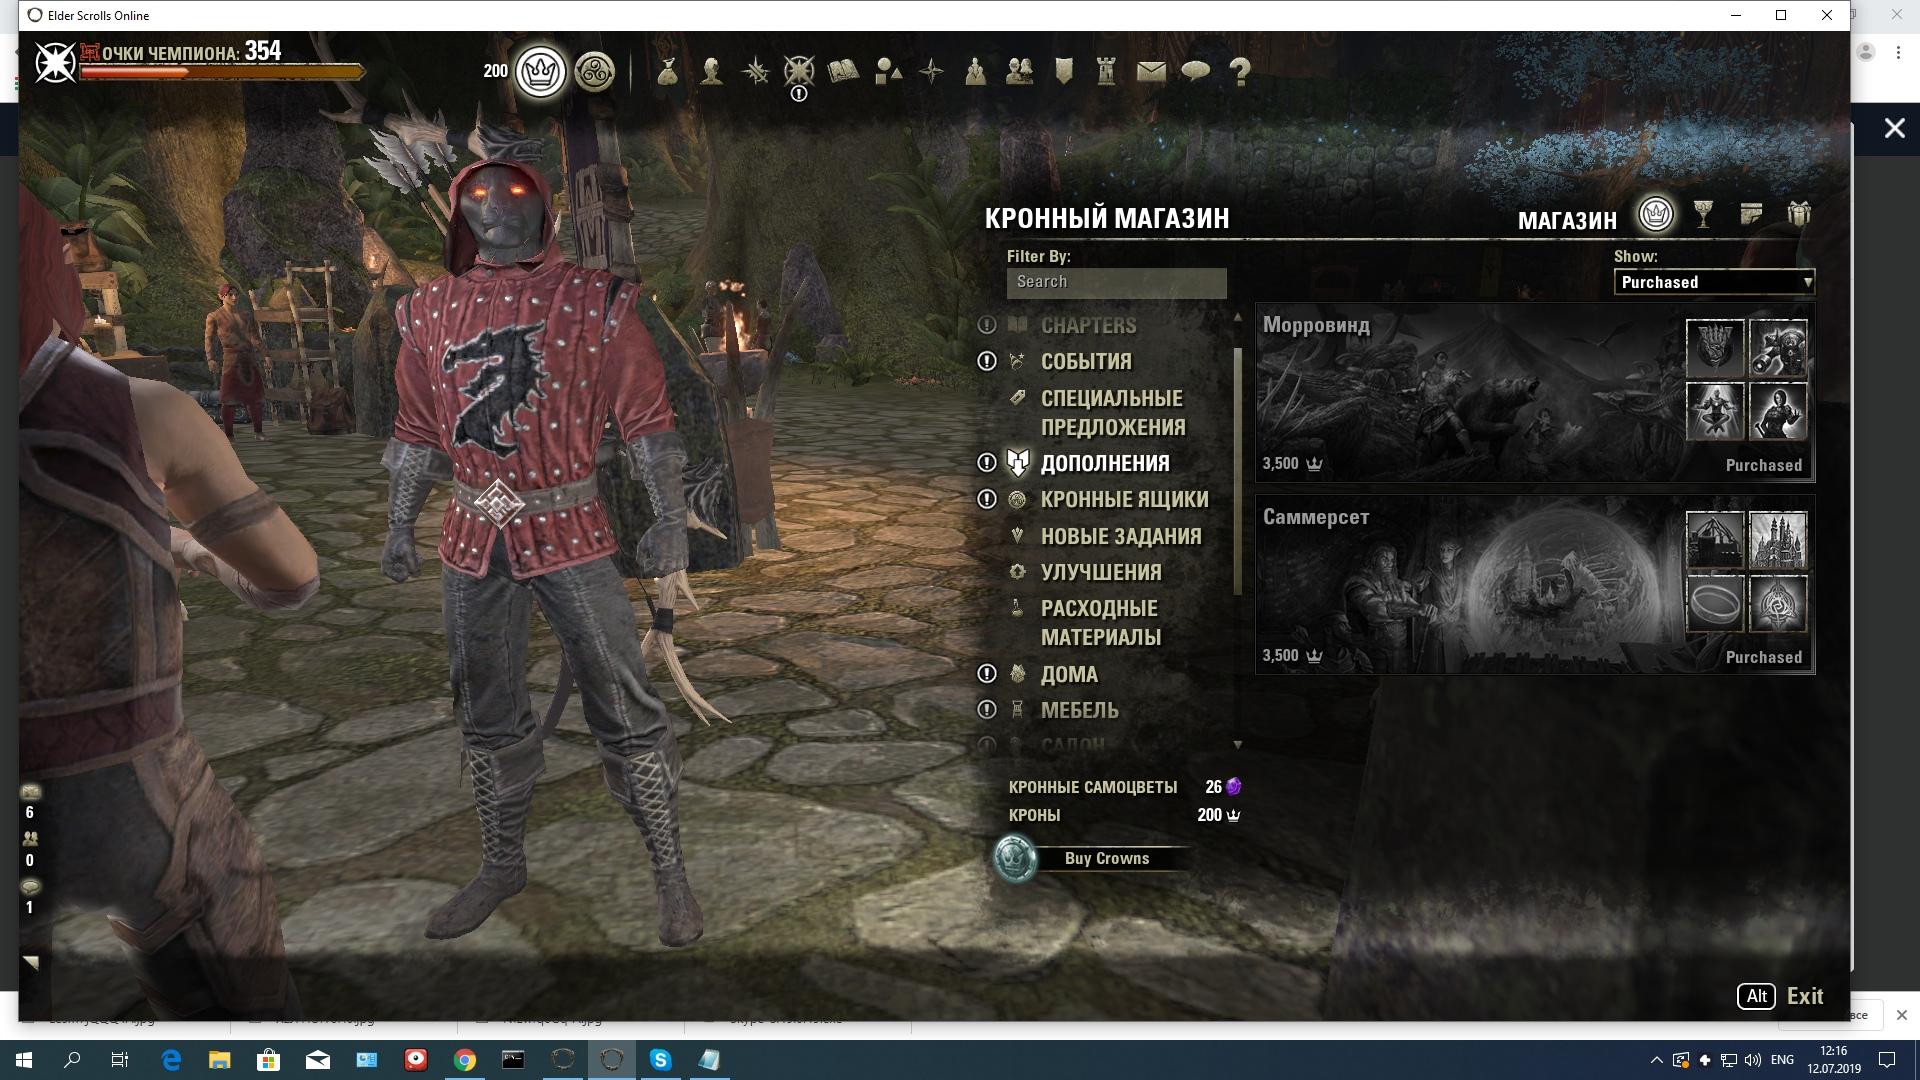 Selling] not steam! 353 nekr Morrowind, Summerset , Elsveyr + bonus